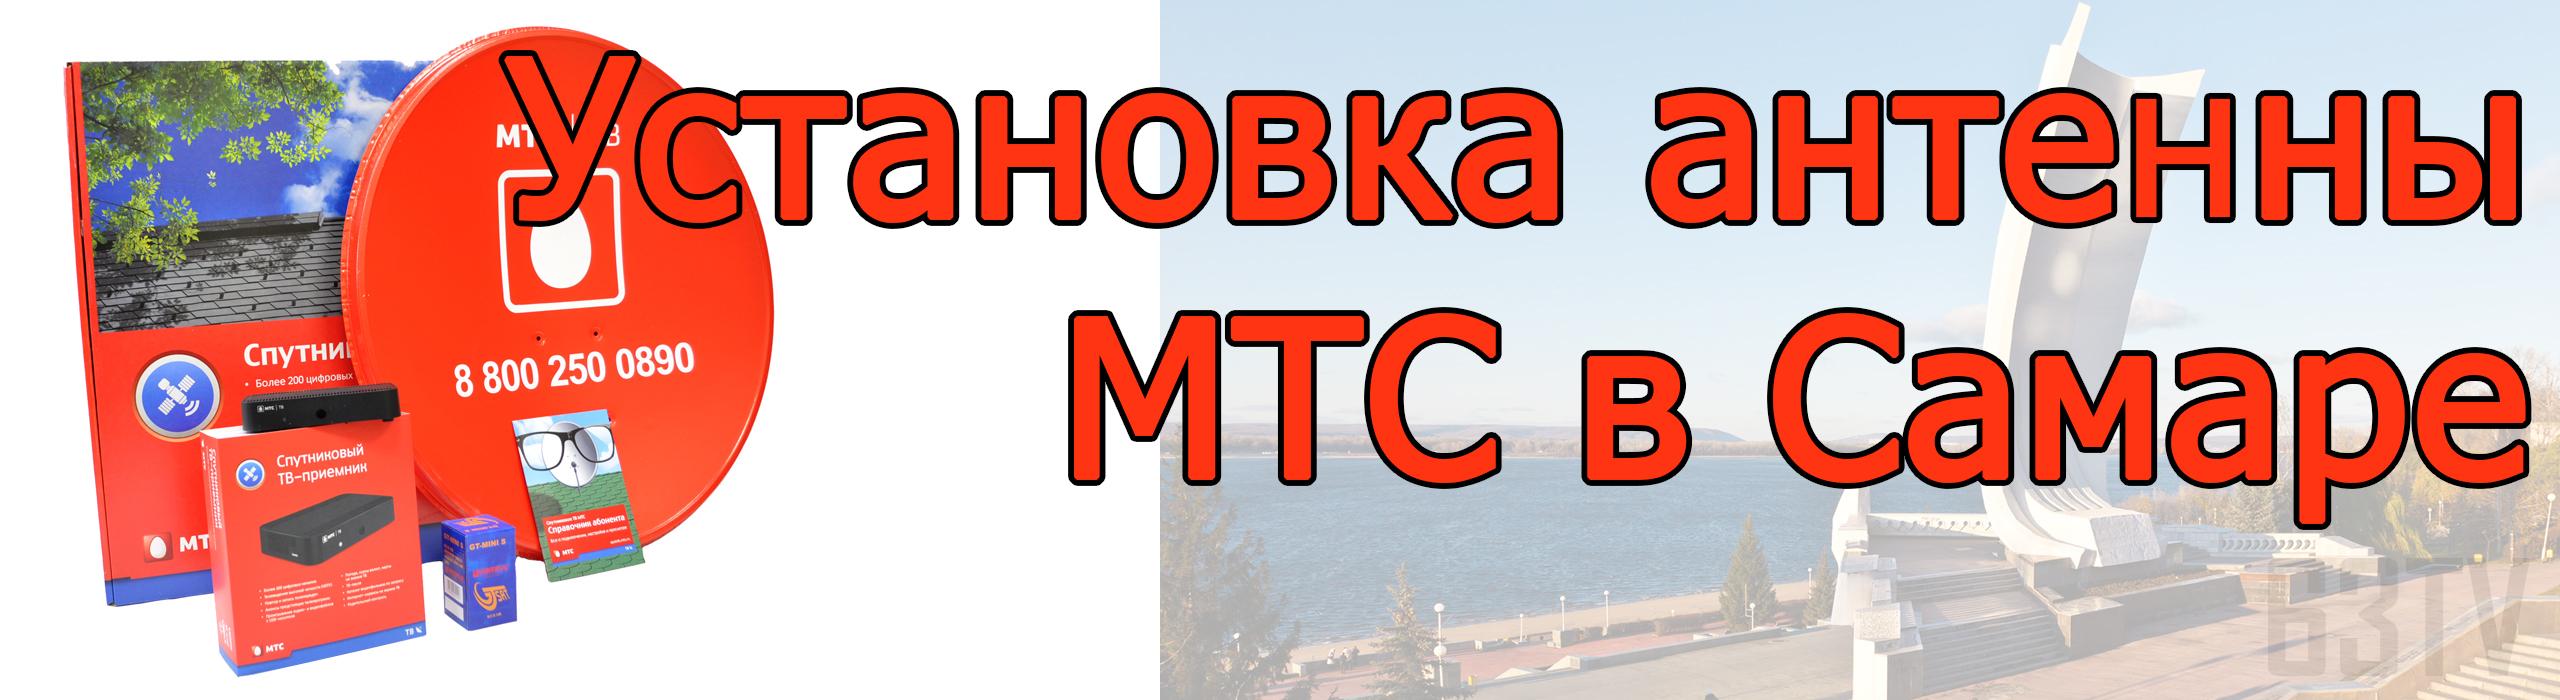 Установка антенны МТС в Самаре